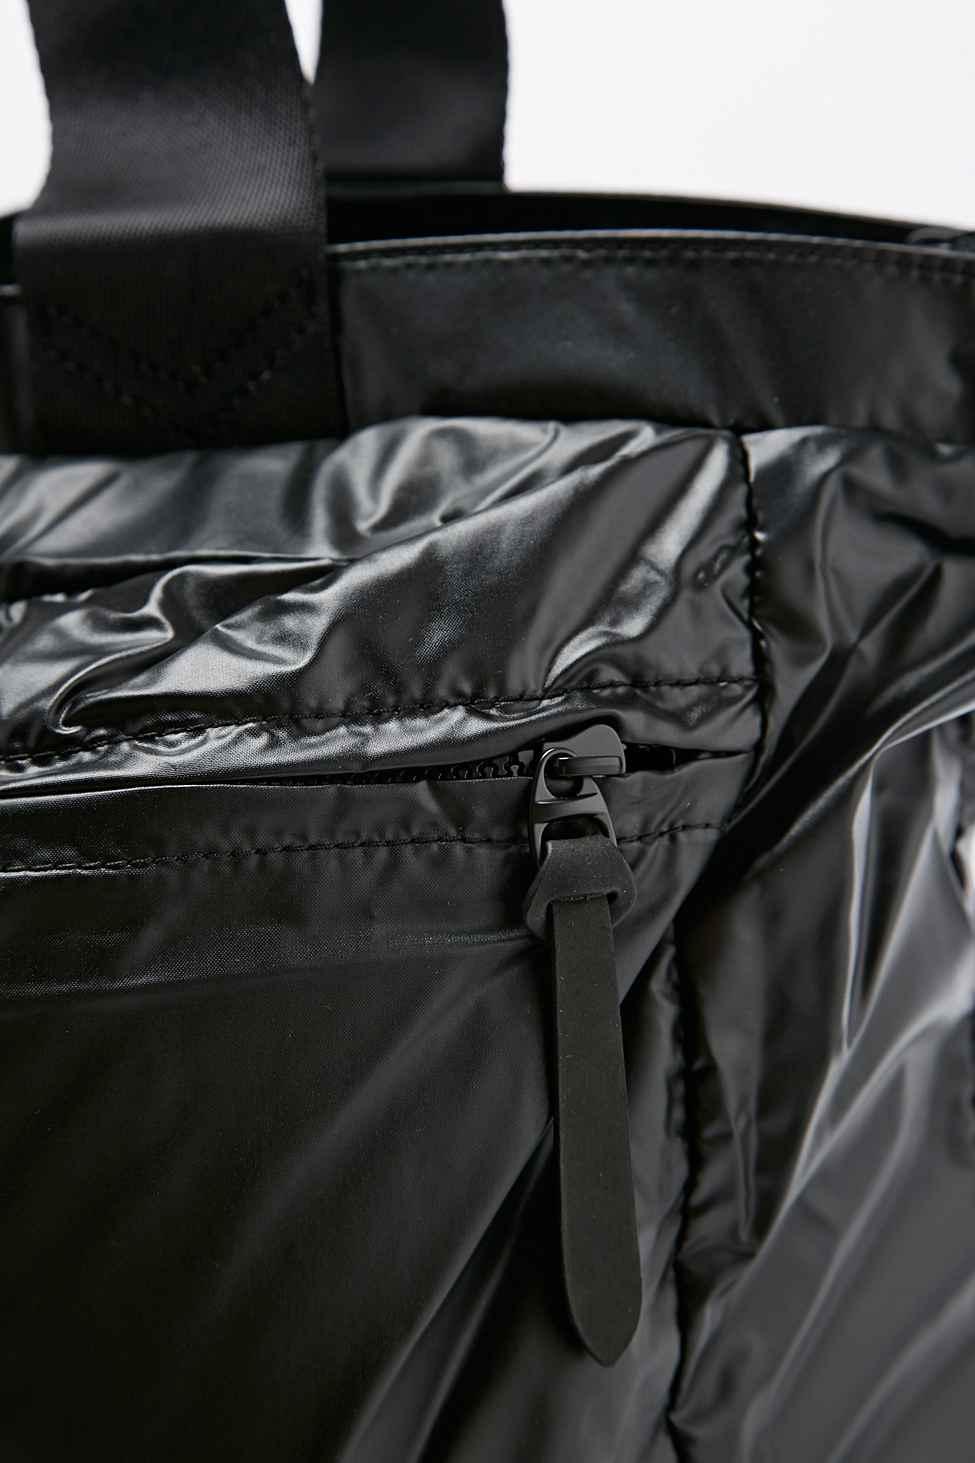 6a9a451bc02b Nike Metallic London Tote Bag In Black in Black - Lyst